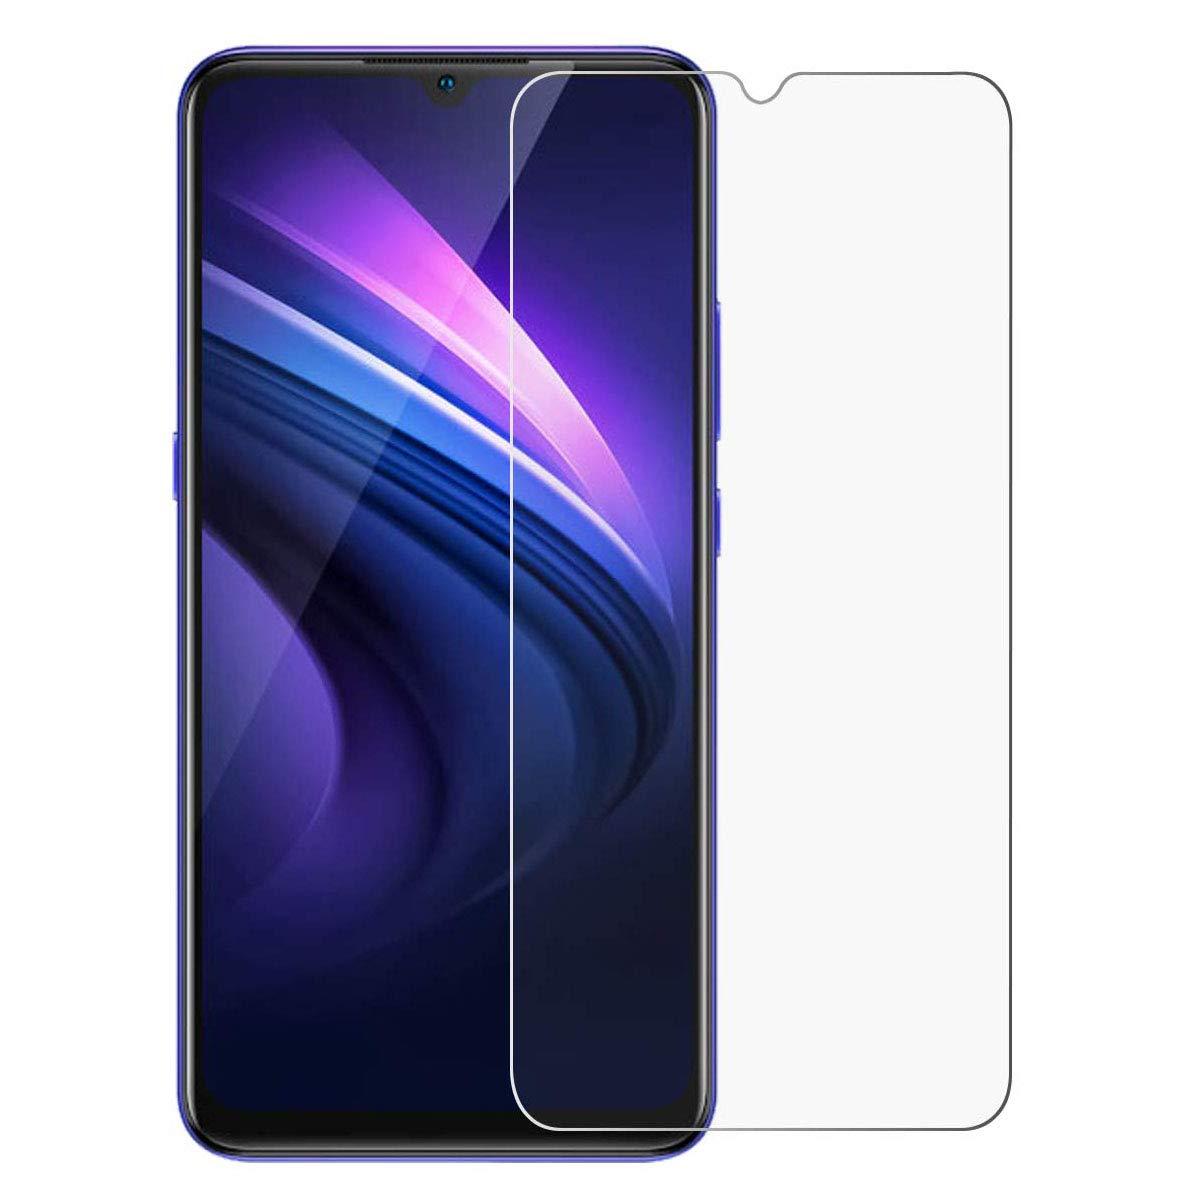 9H Tempered Glass For Vivo IQOO Neo 855 Glass Screen Protector For Vivo IQOO Neo Phone Glass For Vivo IQOO Neo Smartphone